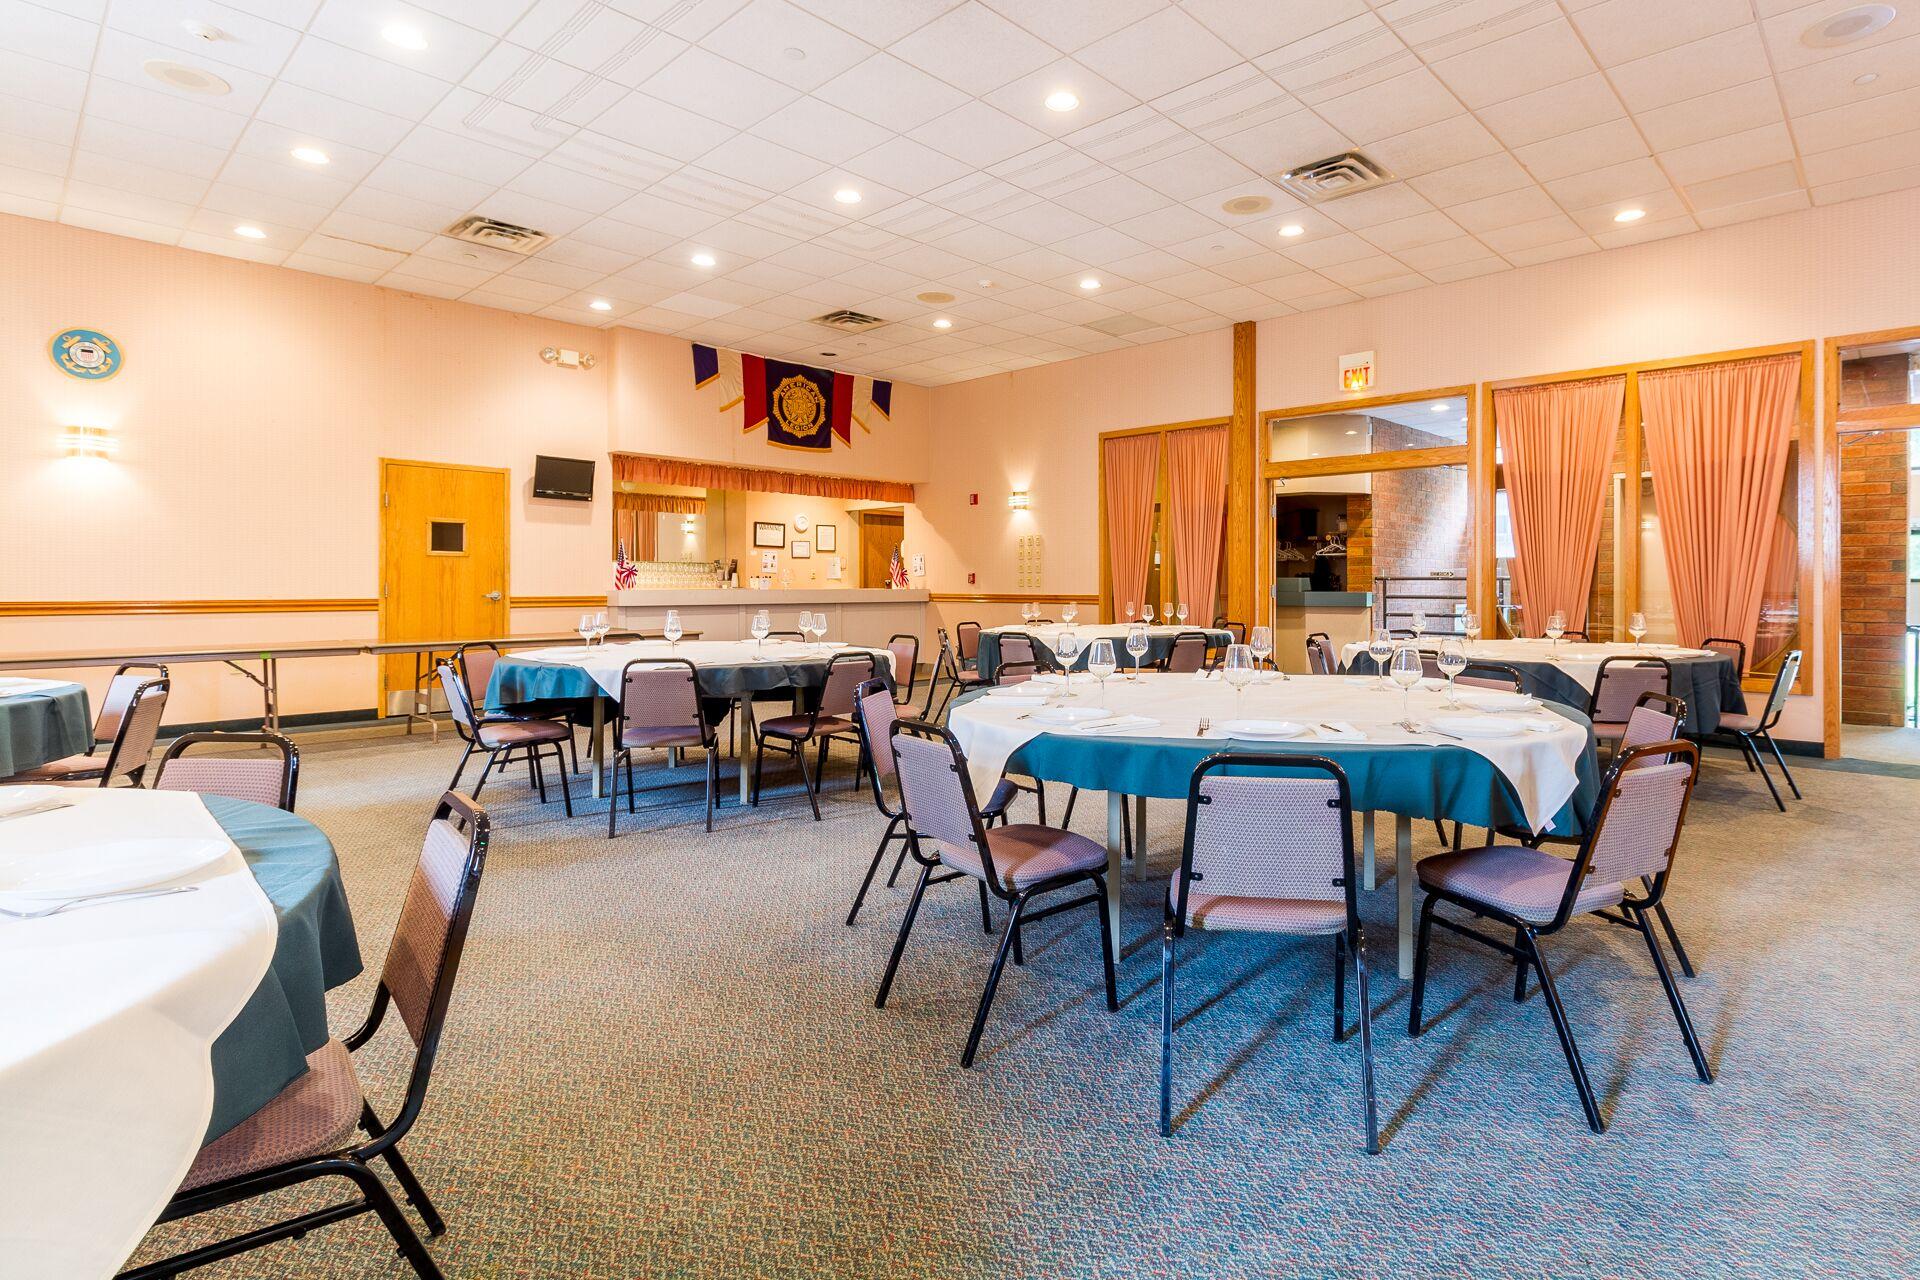 Banquet Hall 2.jpg.jpeg